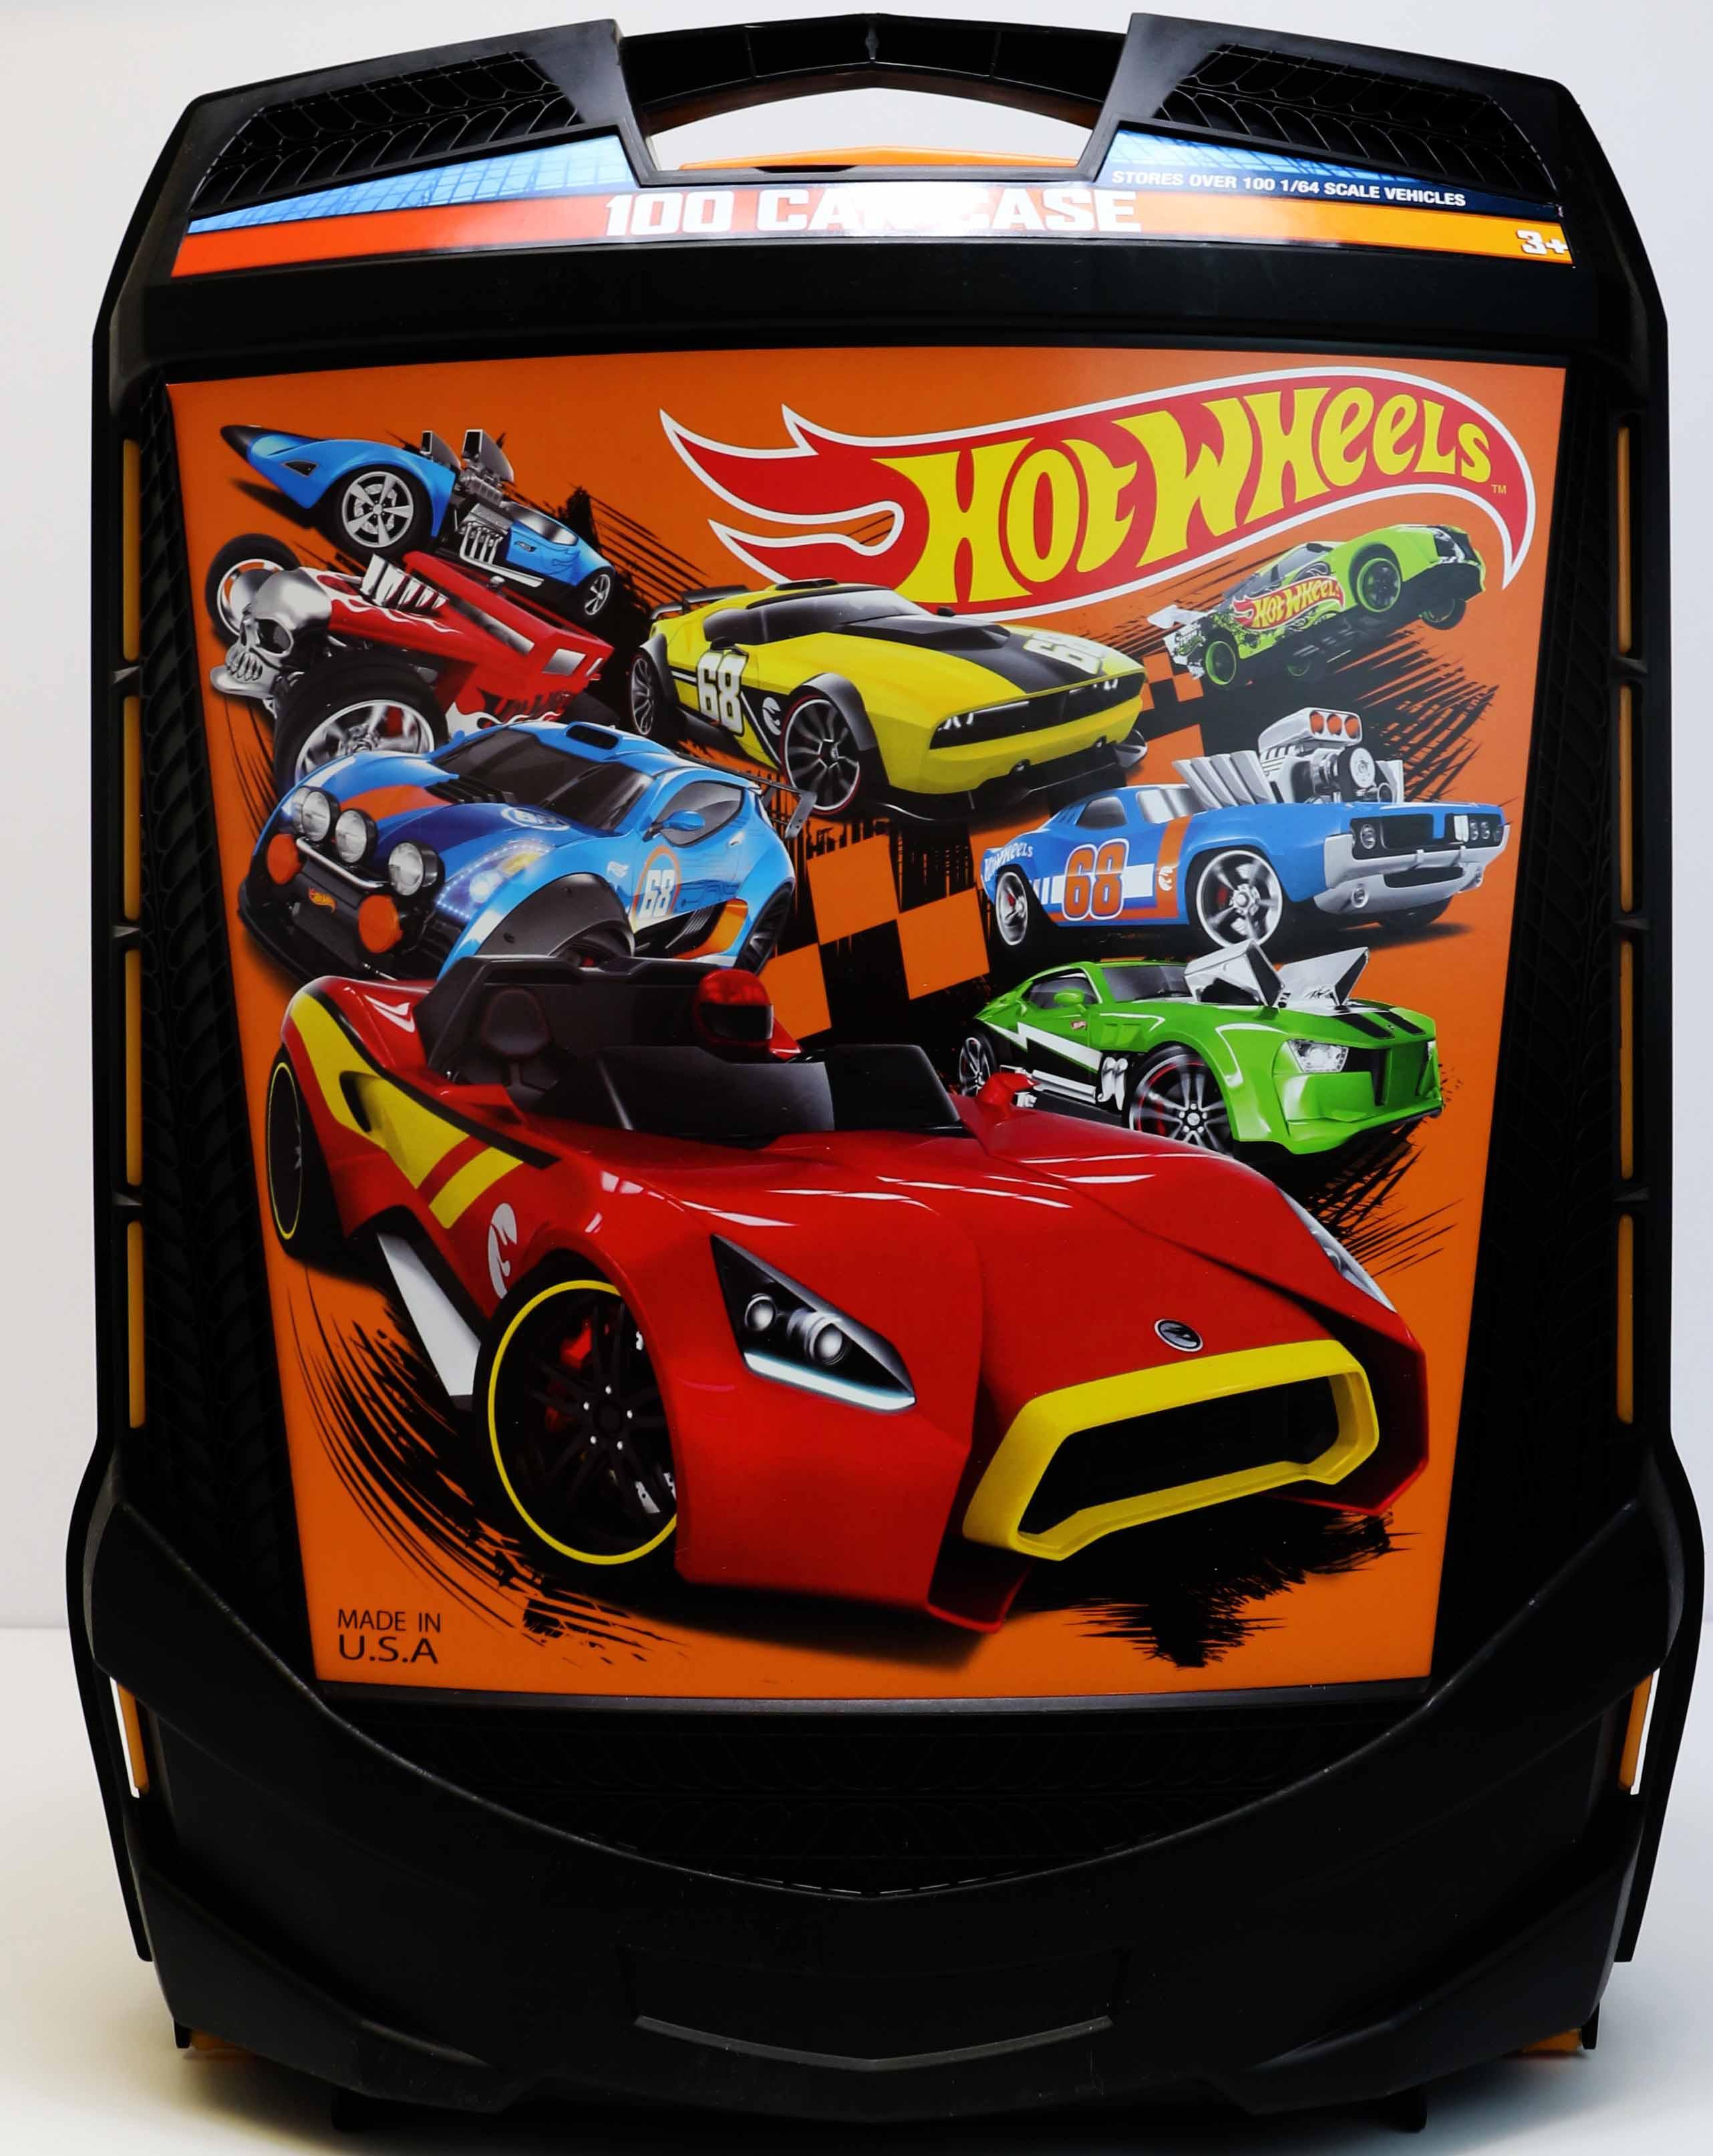 Hot Wheels Toy Car Holder Case : Amazon hot wheels car case toys games